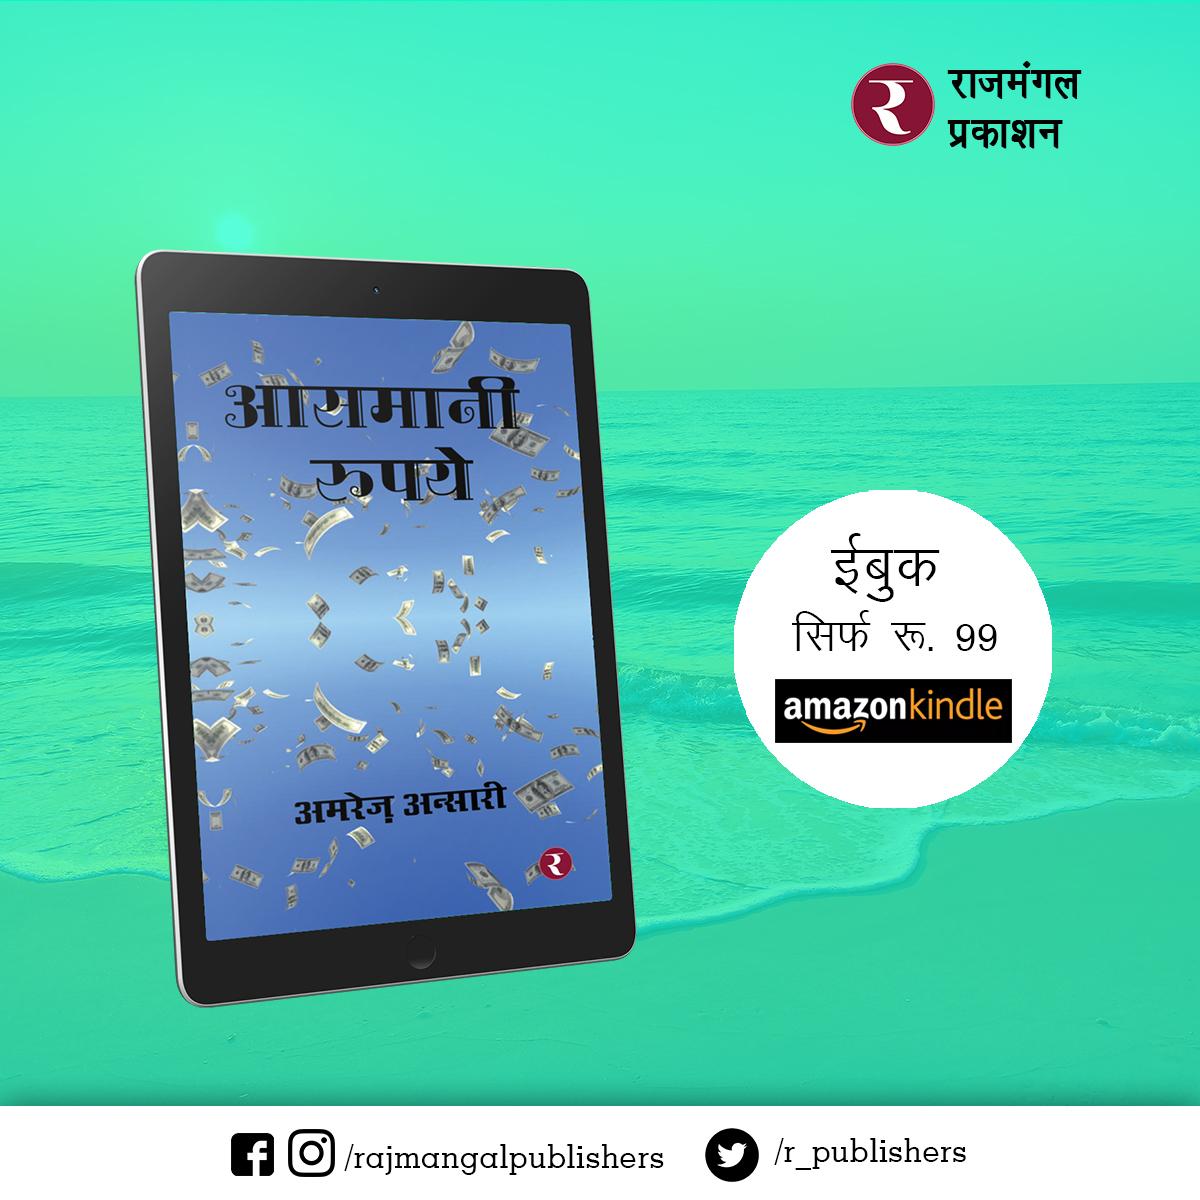 "युवा हिन्दी लेखक अमरेज़ अन्सारी लिखित सामाजिक-राजनीतिक उपन्यास ""आसमानी रुपये"" को आप सिर्फ रु. 99/- में यहाँ से प्राप्त करें : https://t.co/QbNvpqEYGJ  https://t.co/rgbnpRBI8L -- #हिन्दी #HindiBooks #StayHome https://t.co/NjwzU2Rp84"